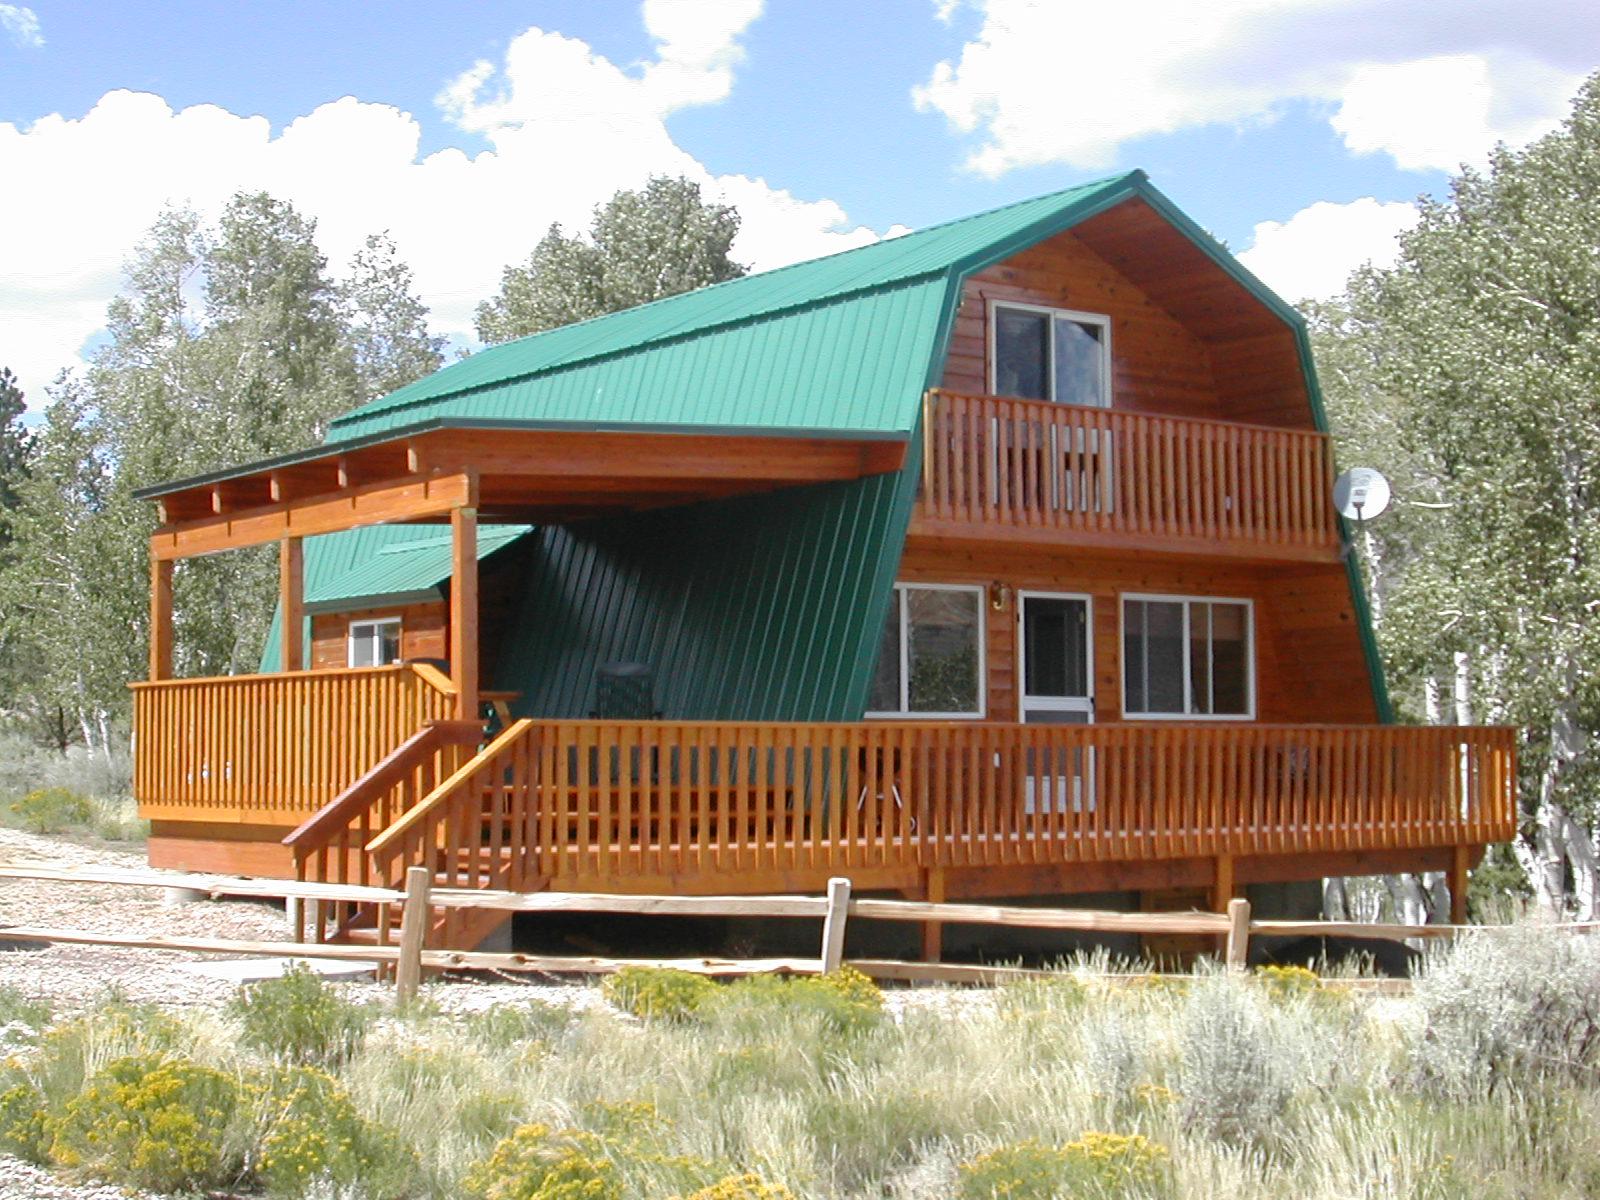 panguitch lake utah real estate cabin for sale 27260